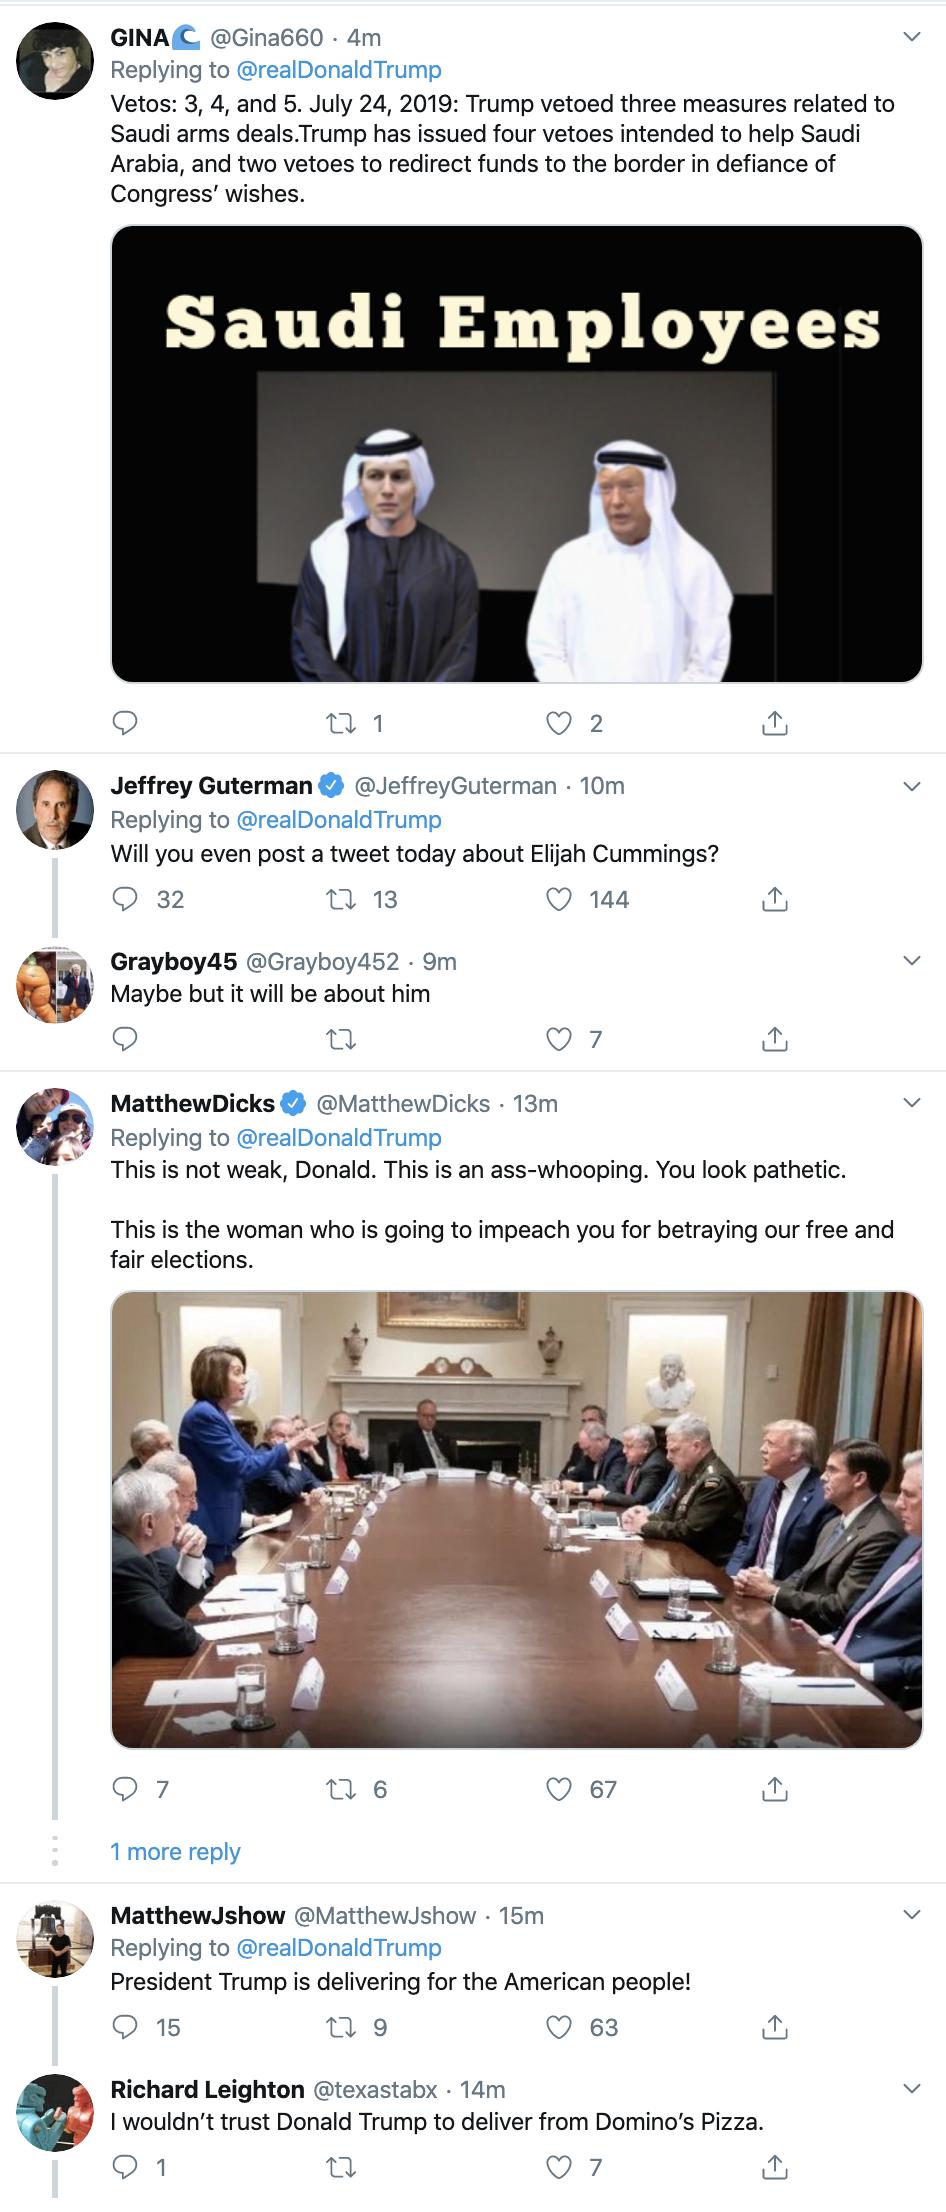 Screen-Shot-2019-10-17-at-7.14.32-AM Trump Has Thursday Morning Multi-Tweet Elijah Cummings Meltdown Corruption Crime Domestic Policy Donald Trump Election 2016 Election 2020 Featured Media Politics Television Top Stories